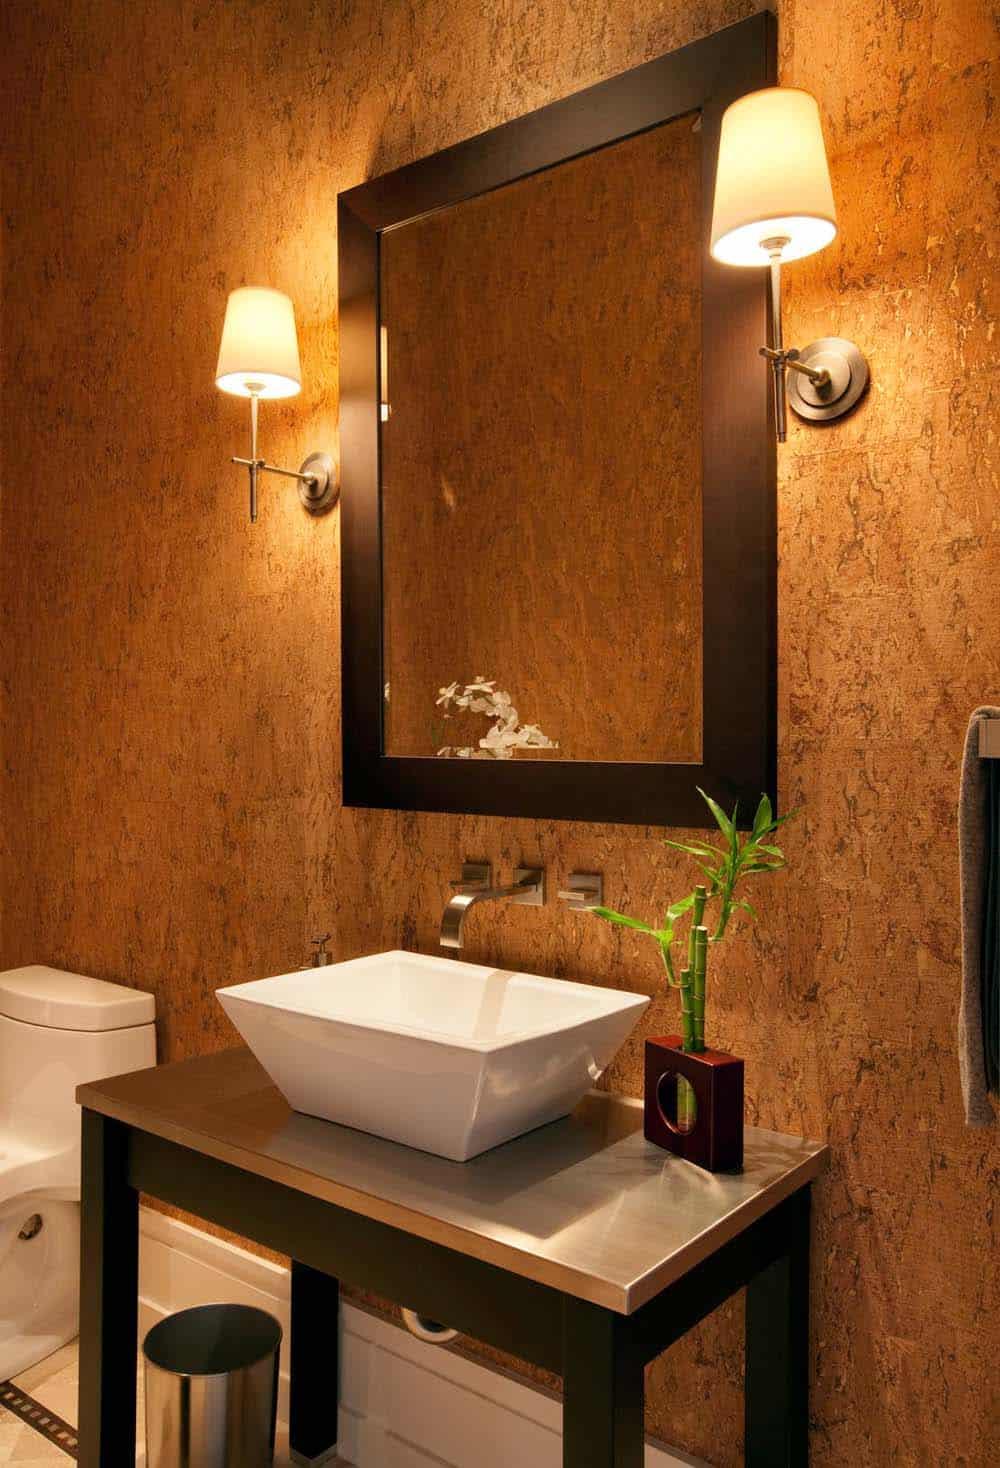 maison-de-plage-moderne-herscoe-hajjar-architectes-28-1-kindesign